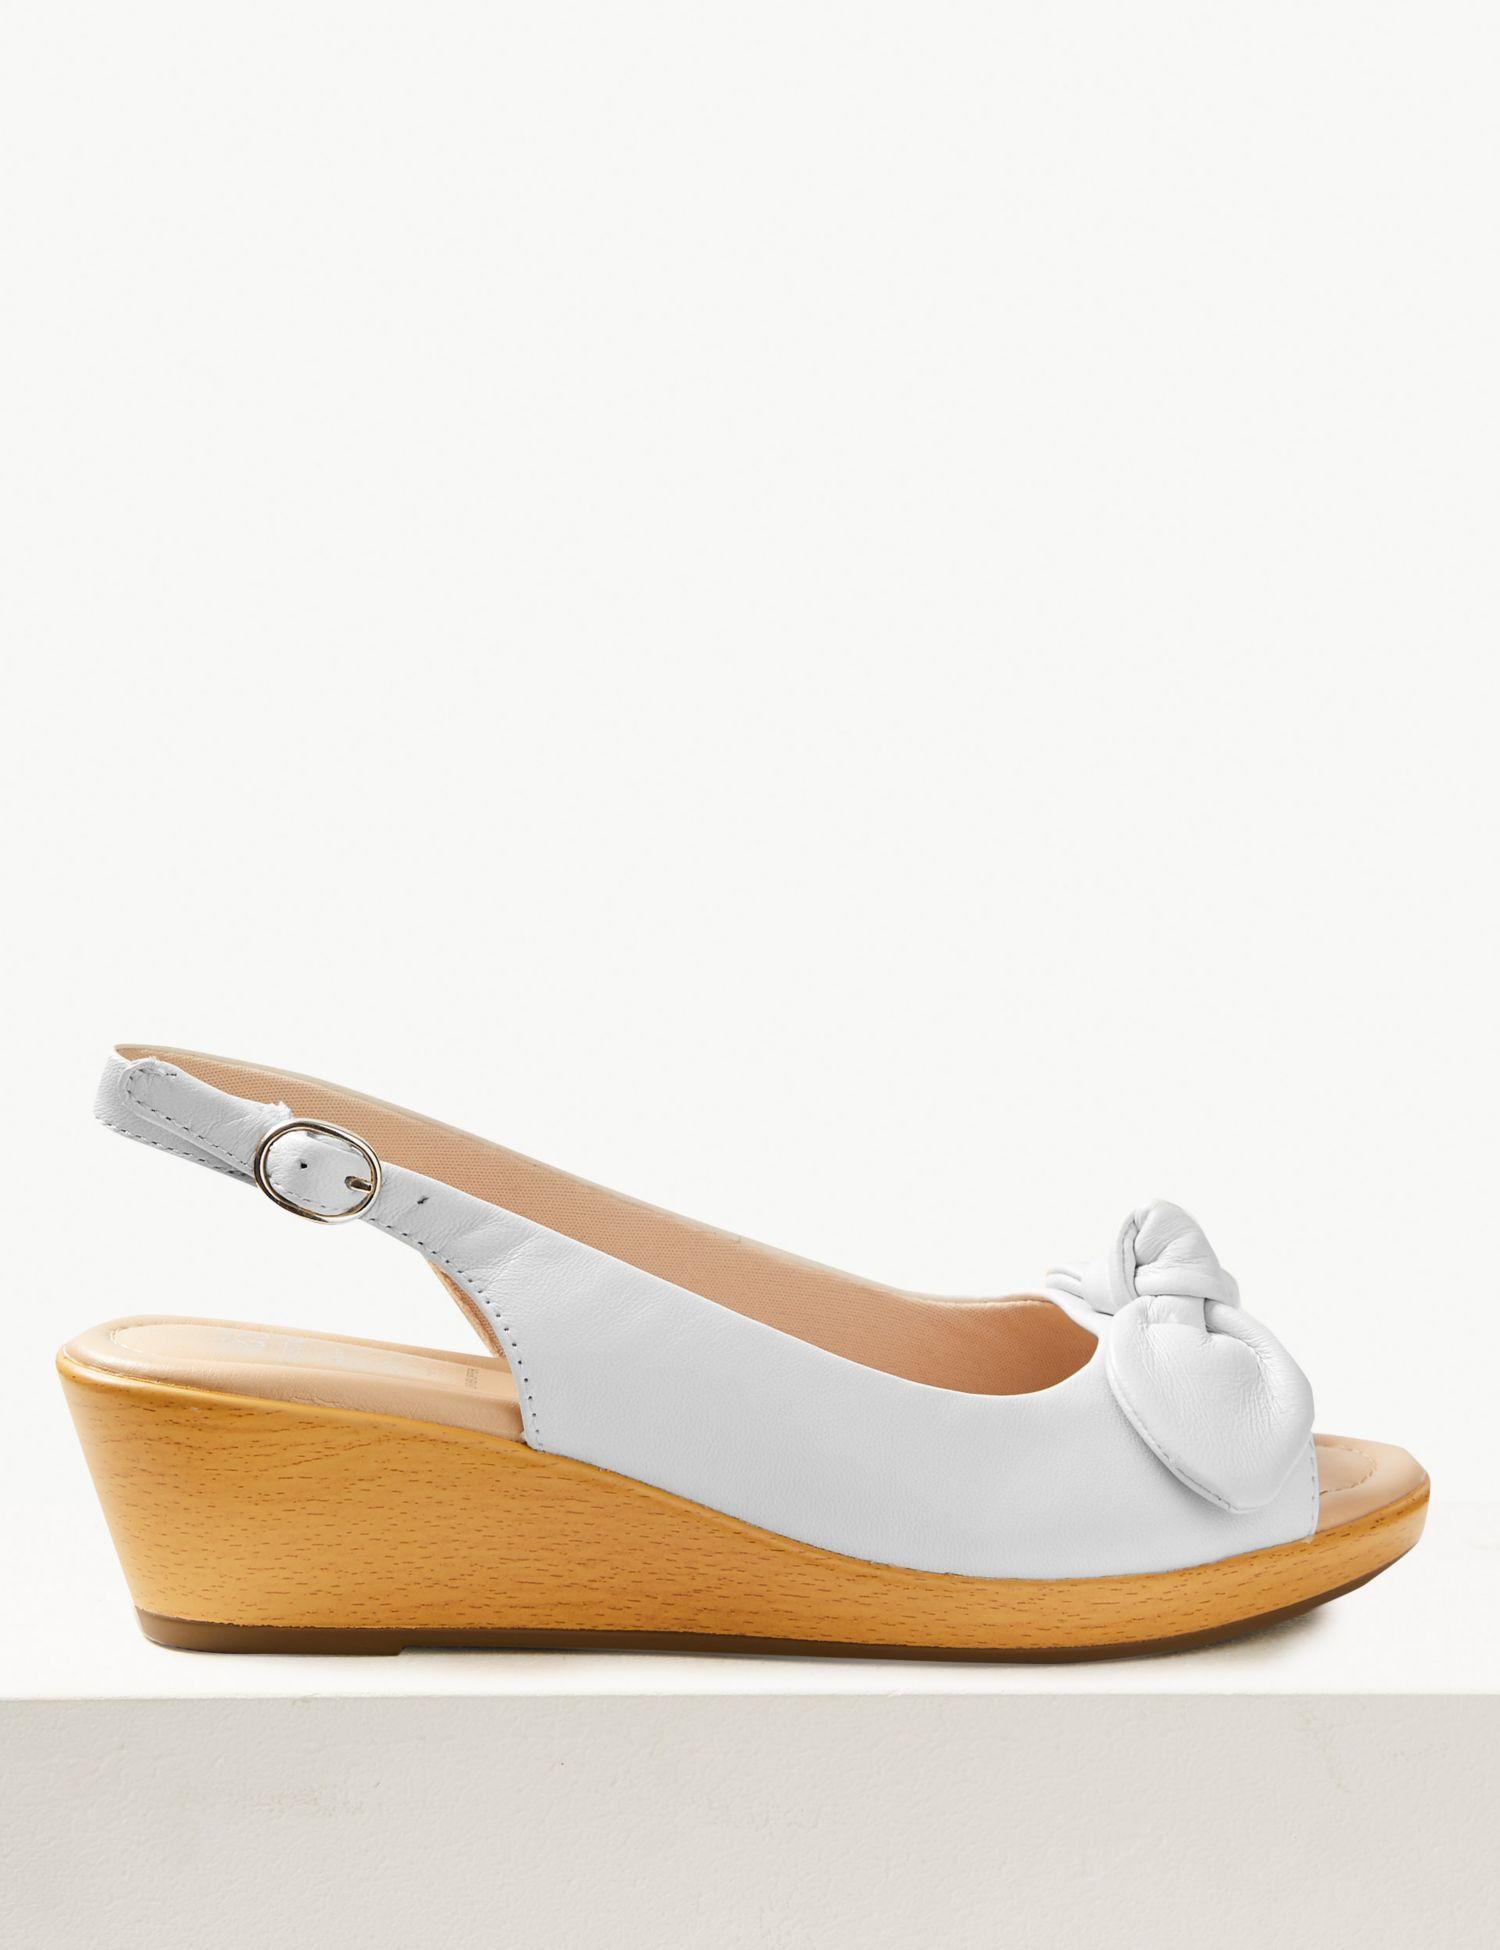 986a9913de0 Marks & Spencer Wide Fit Suede Wedge Heel Slingback Sandals in White ...